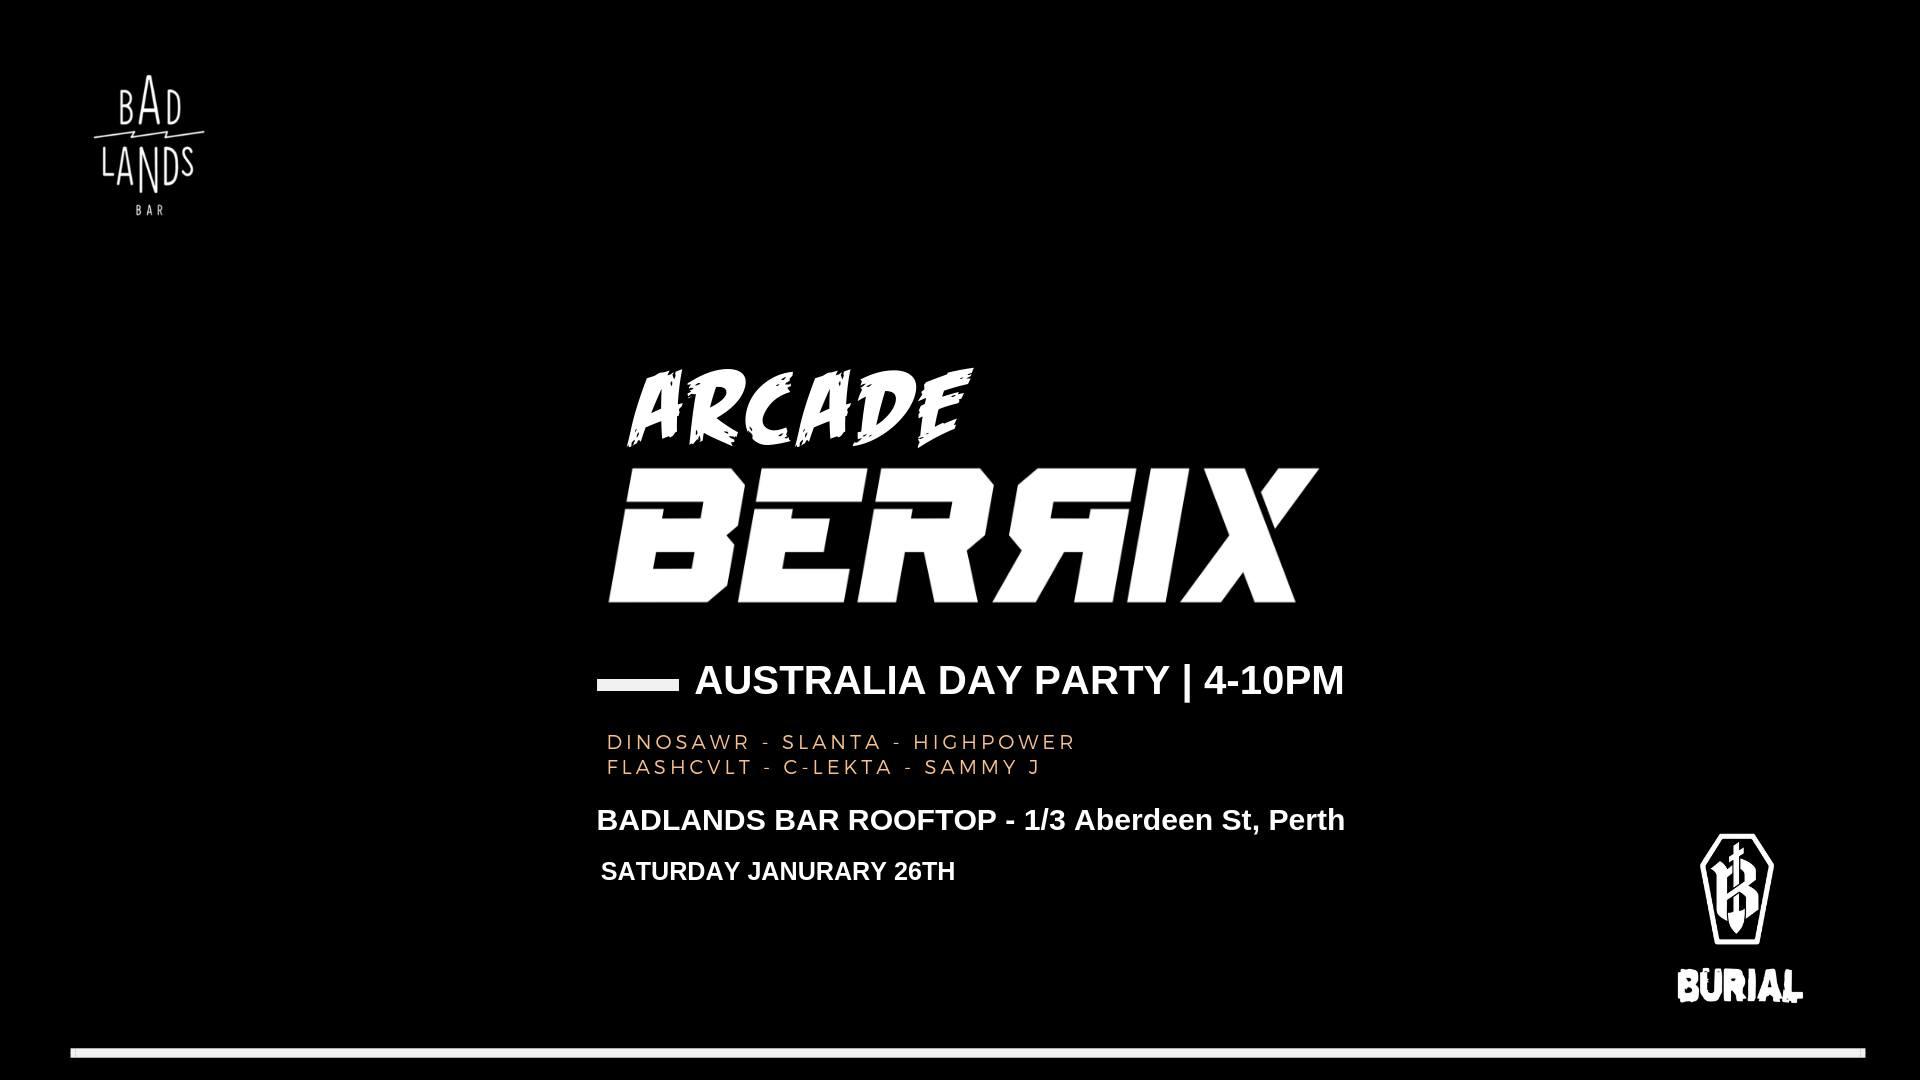 Arcade x Burial present Berrix (Aus Day Party)